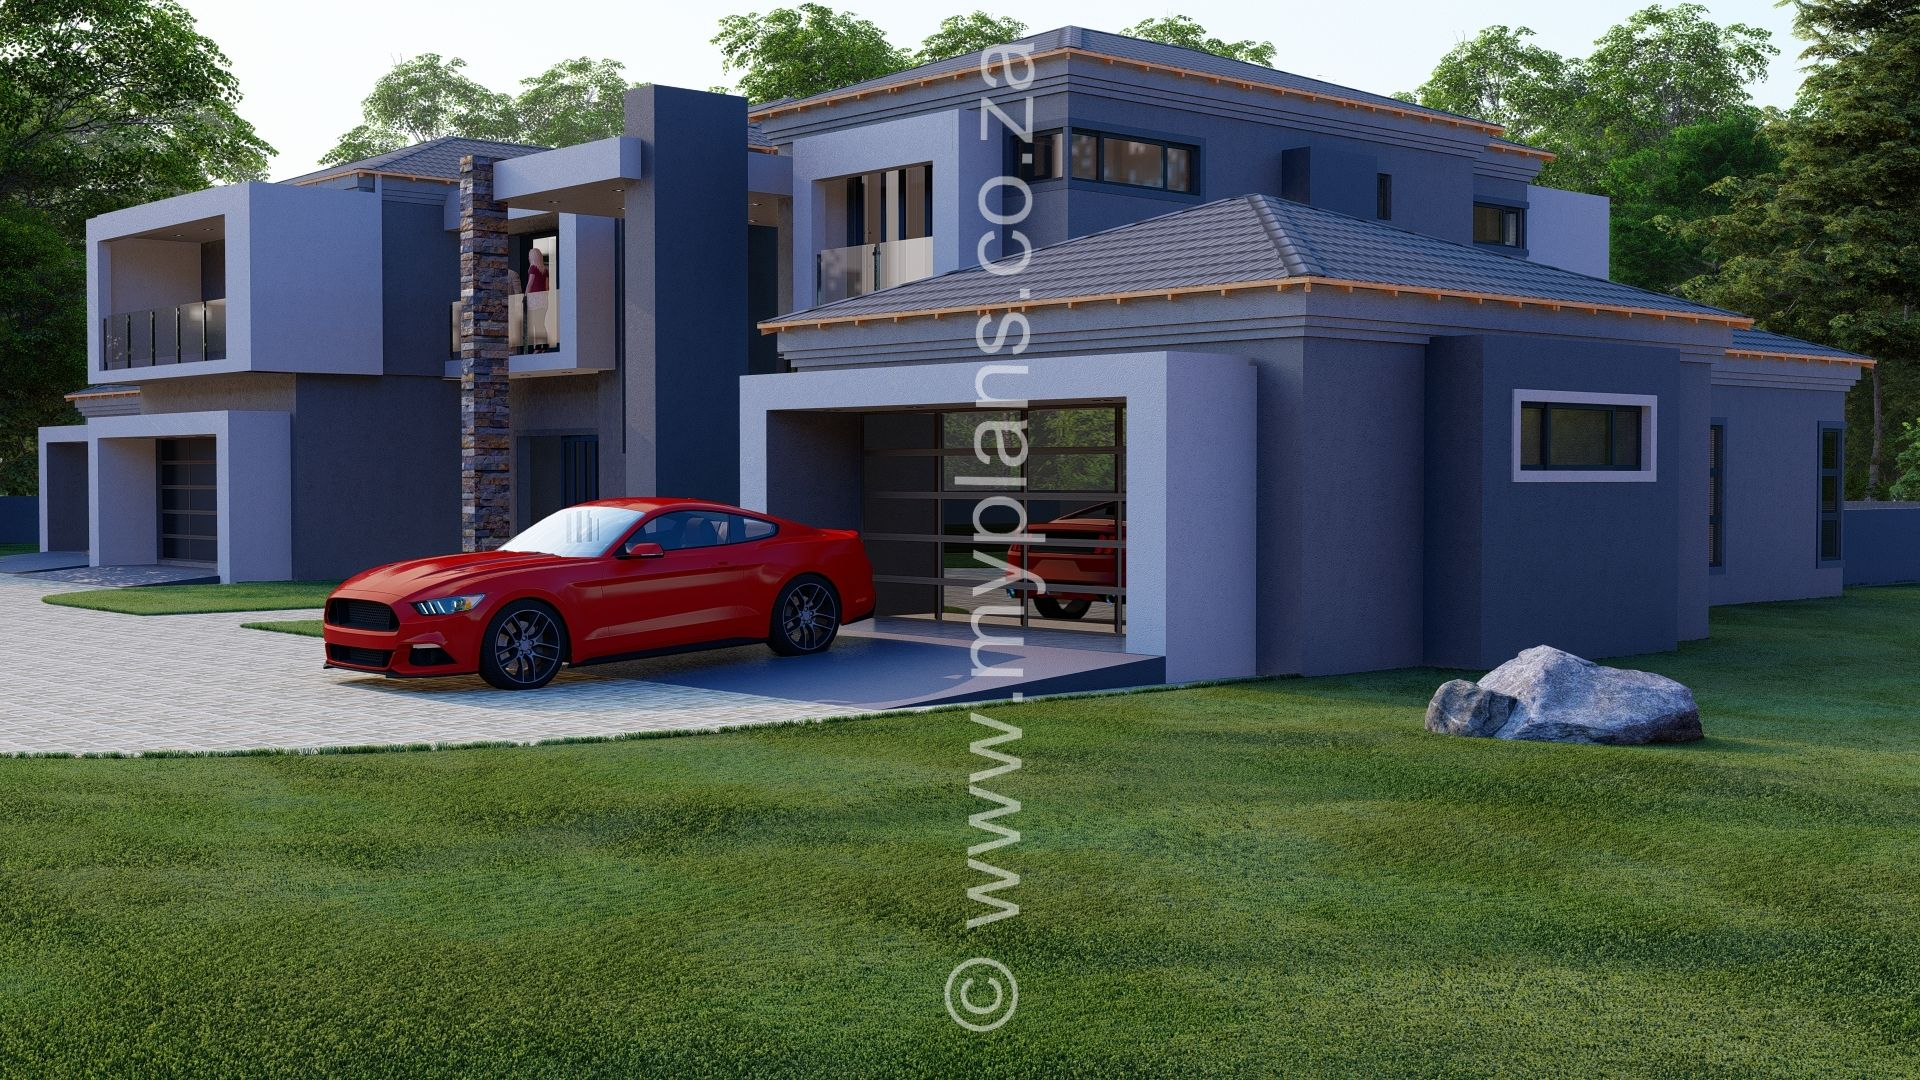 6 Bedroom House Plan Mlb N01 House Plans South Africa 6 Bedroom House Plans Double Storey House Plans